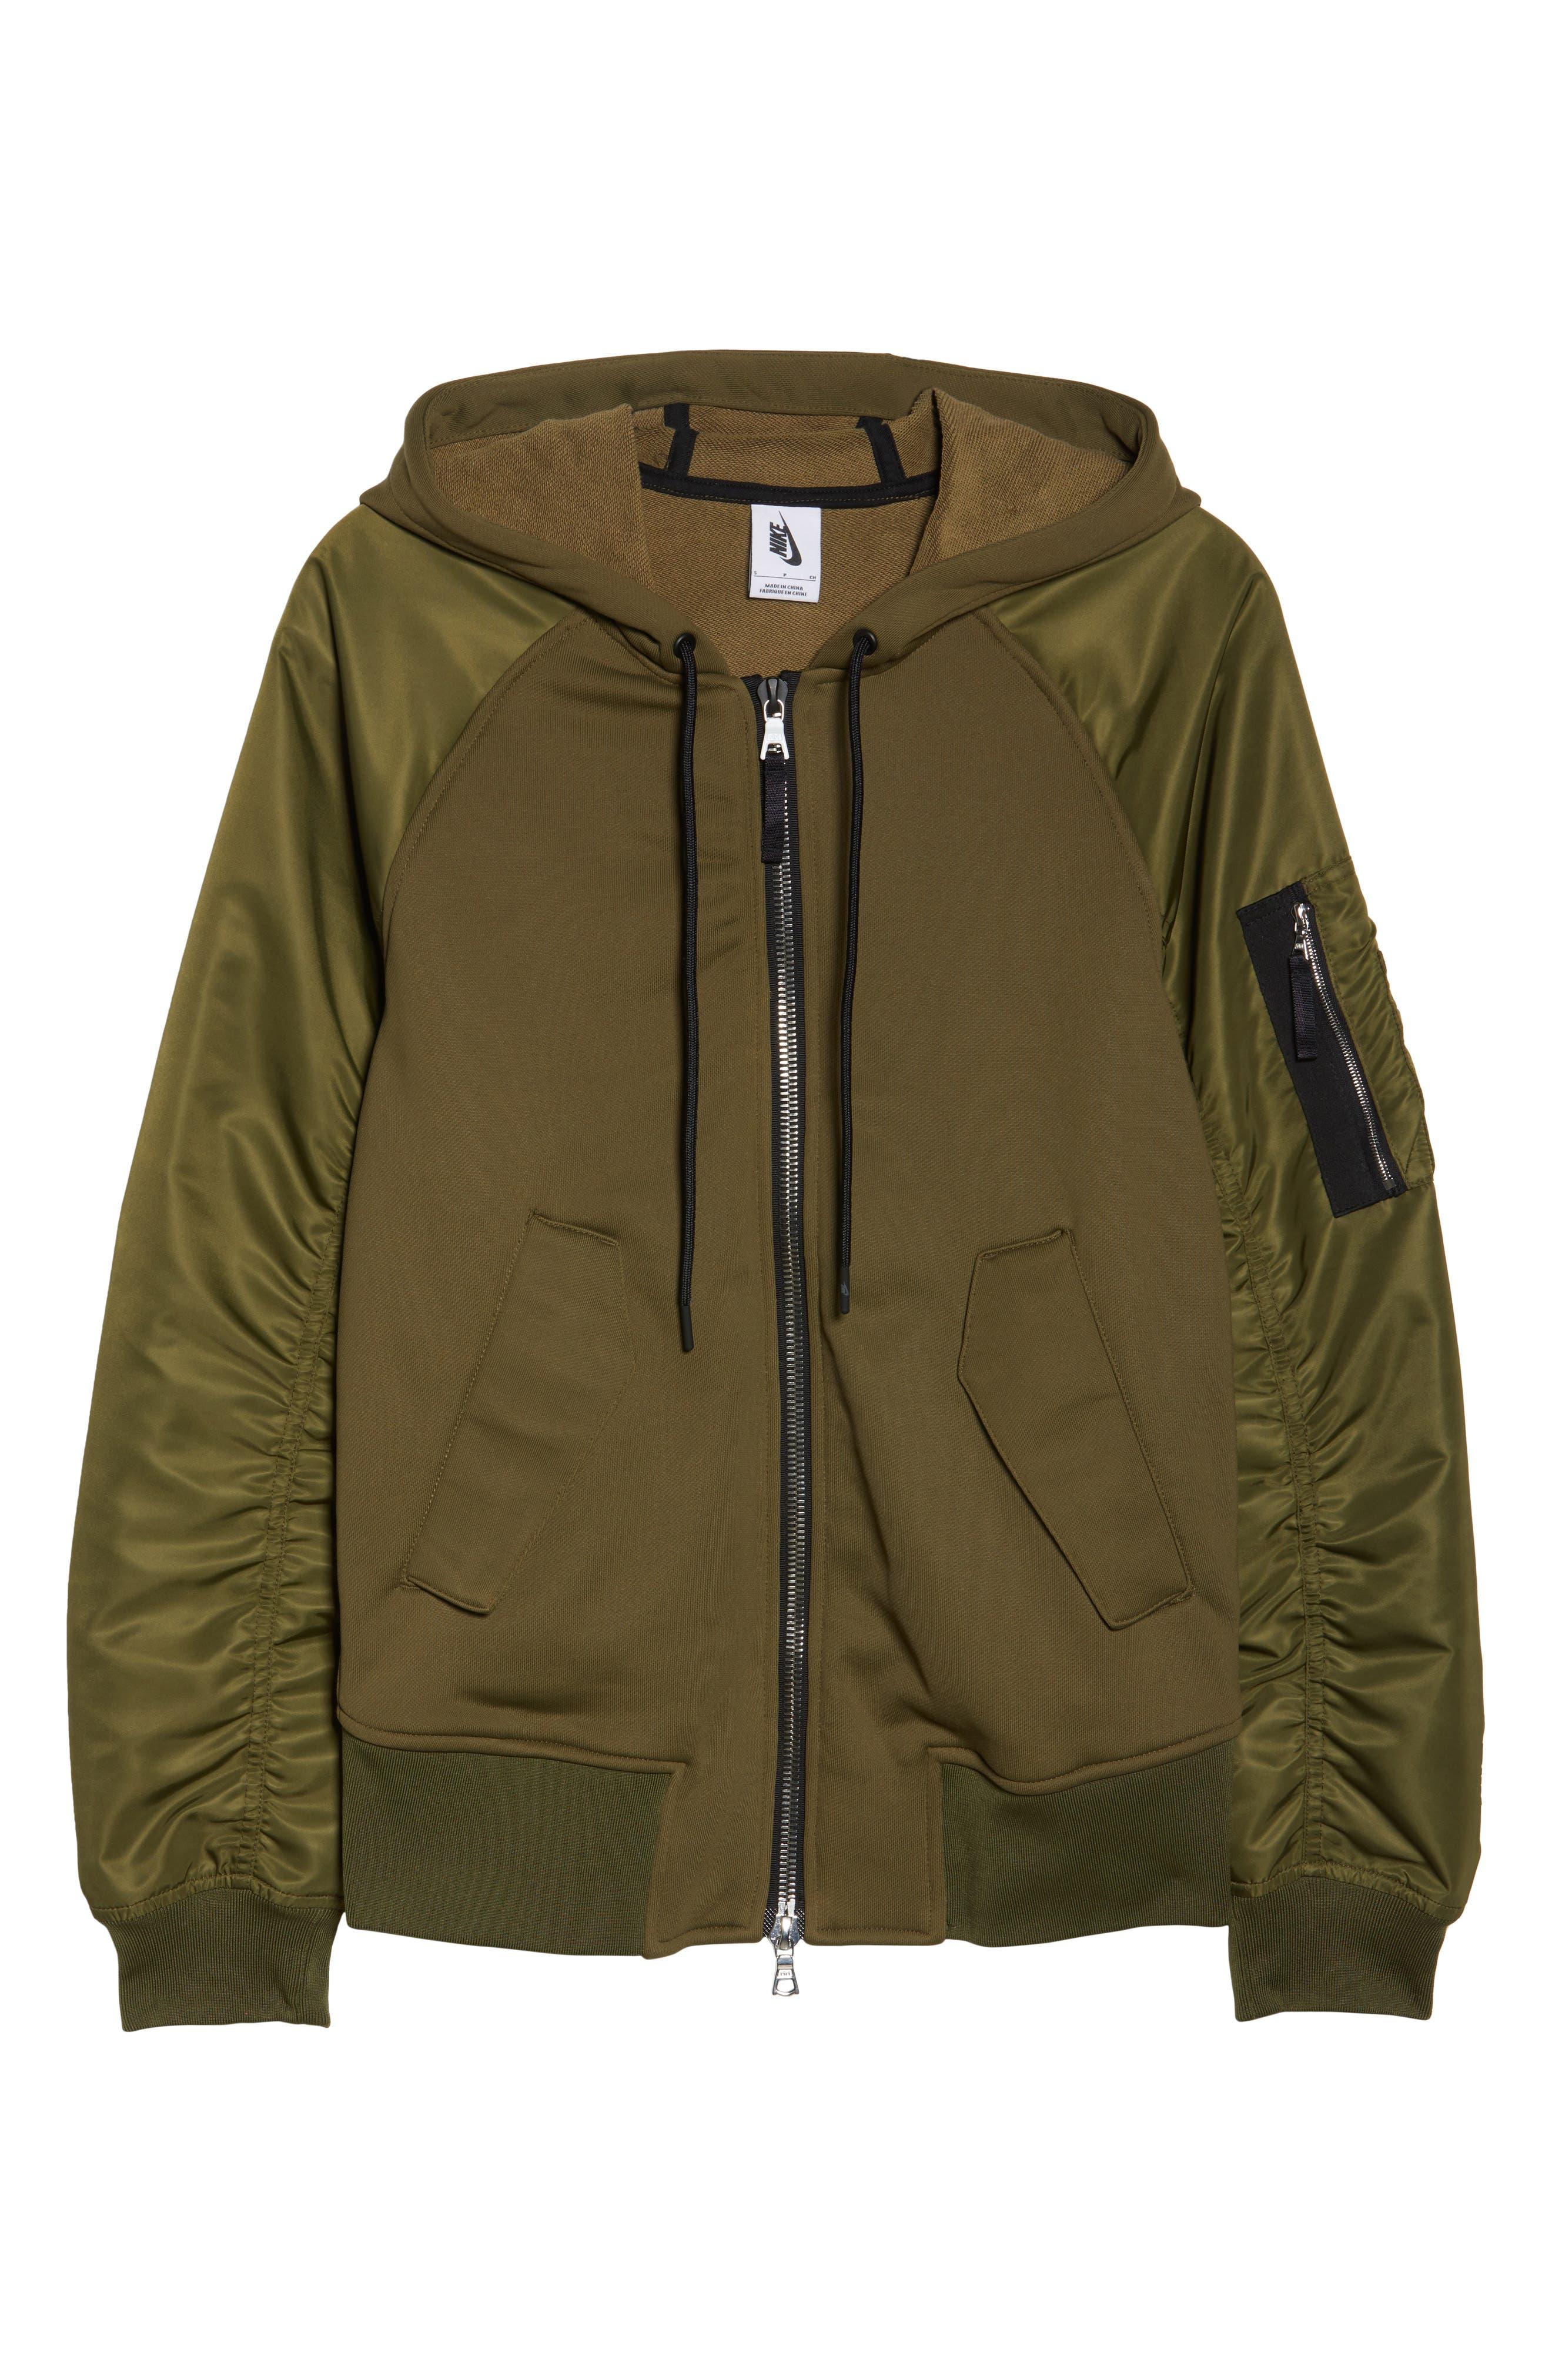 NikeLab Women's Mixed Media Bomber Jacket,                             Alternate thumbnail 6, color,                             Olive Canvas/ Black